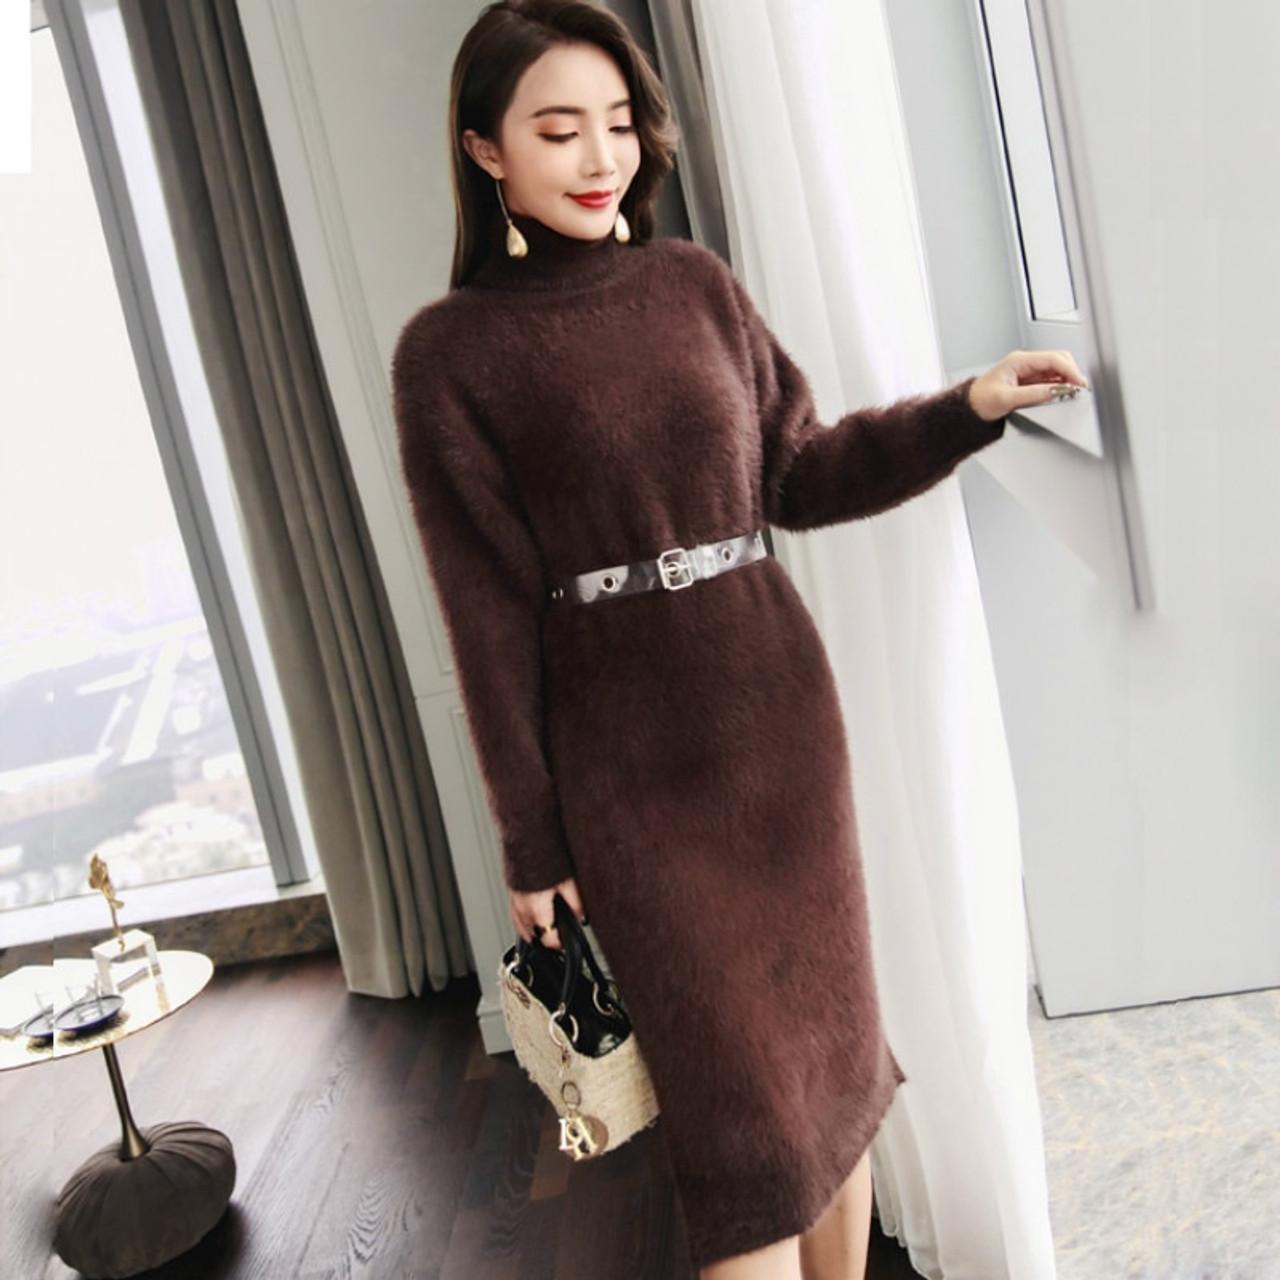 38216a9bfb3 Autumn Winter Lady Elegant Warm Knitted Dress Loose Casual Turtleneck Long  Sleeve Sash Sweater Dress High Waist Warm Dress